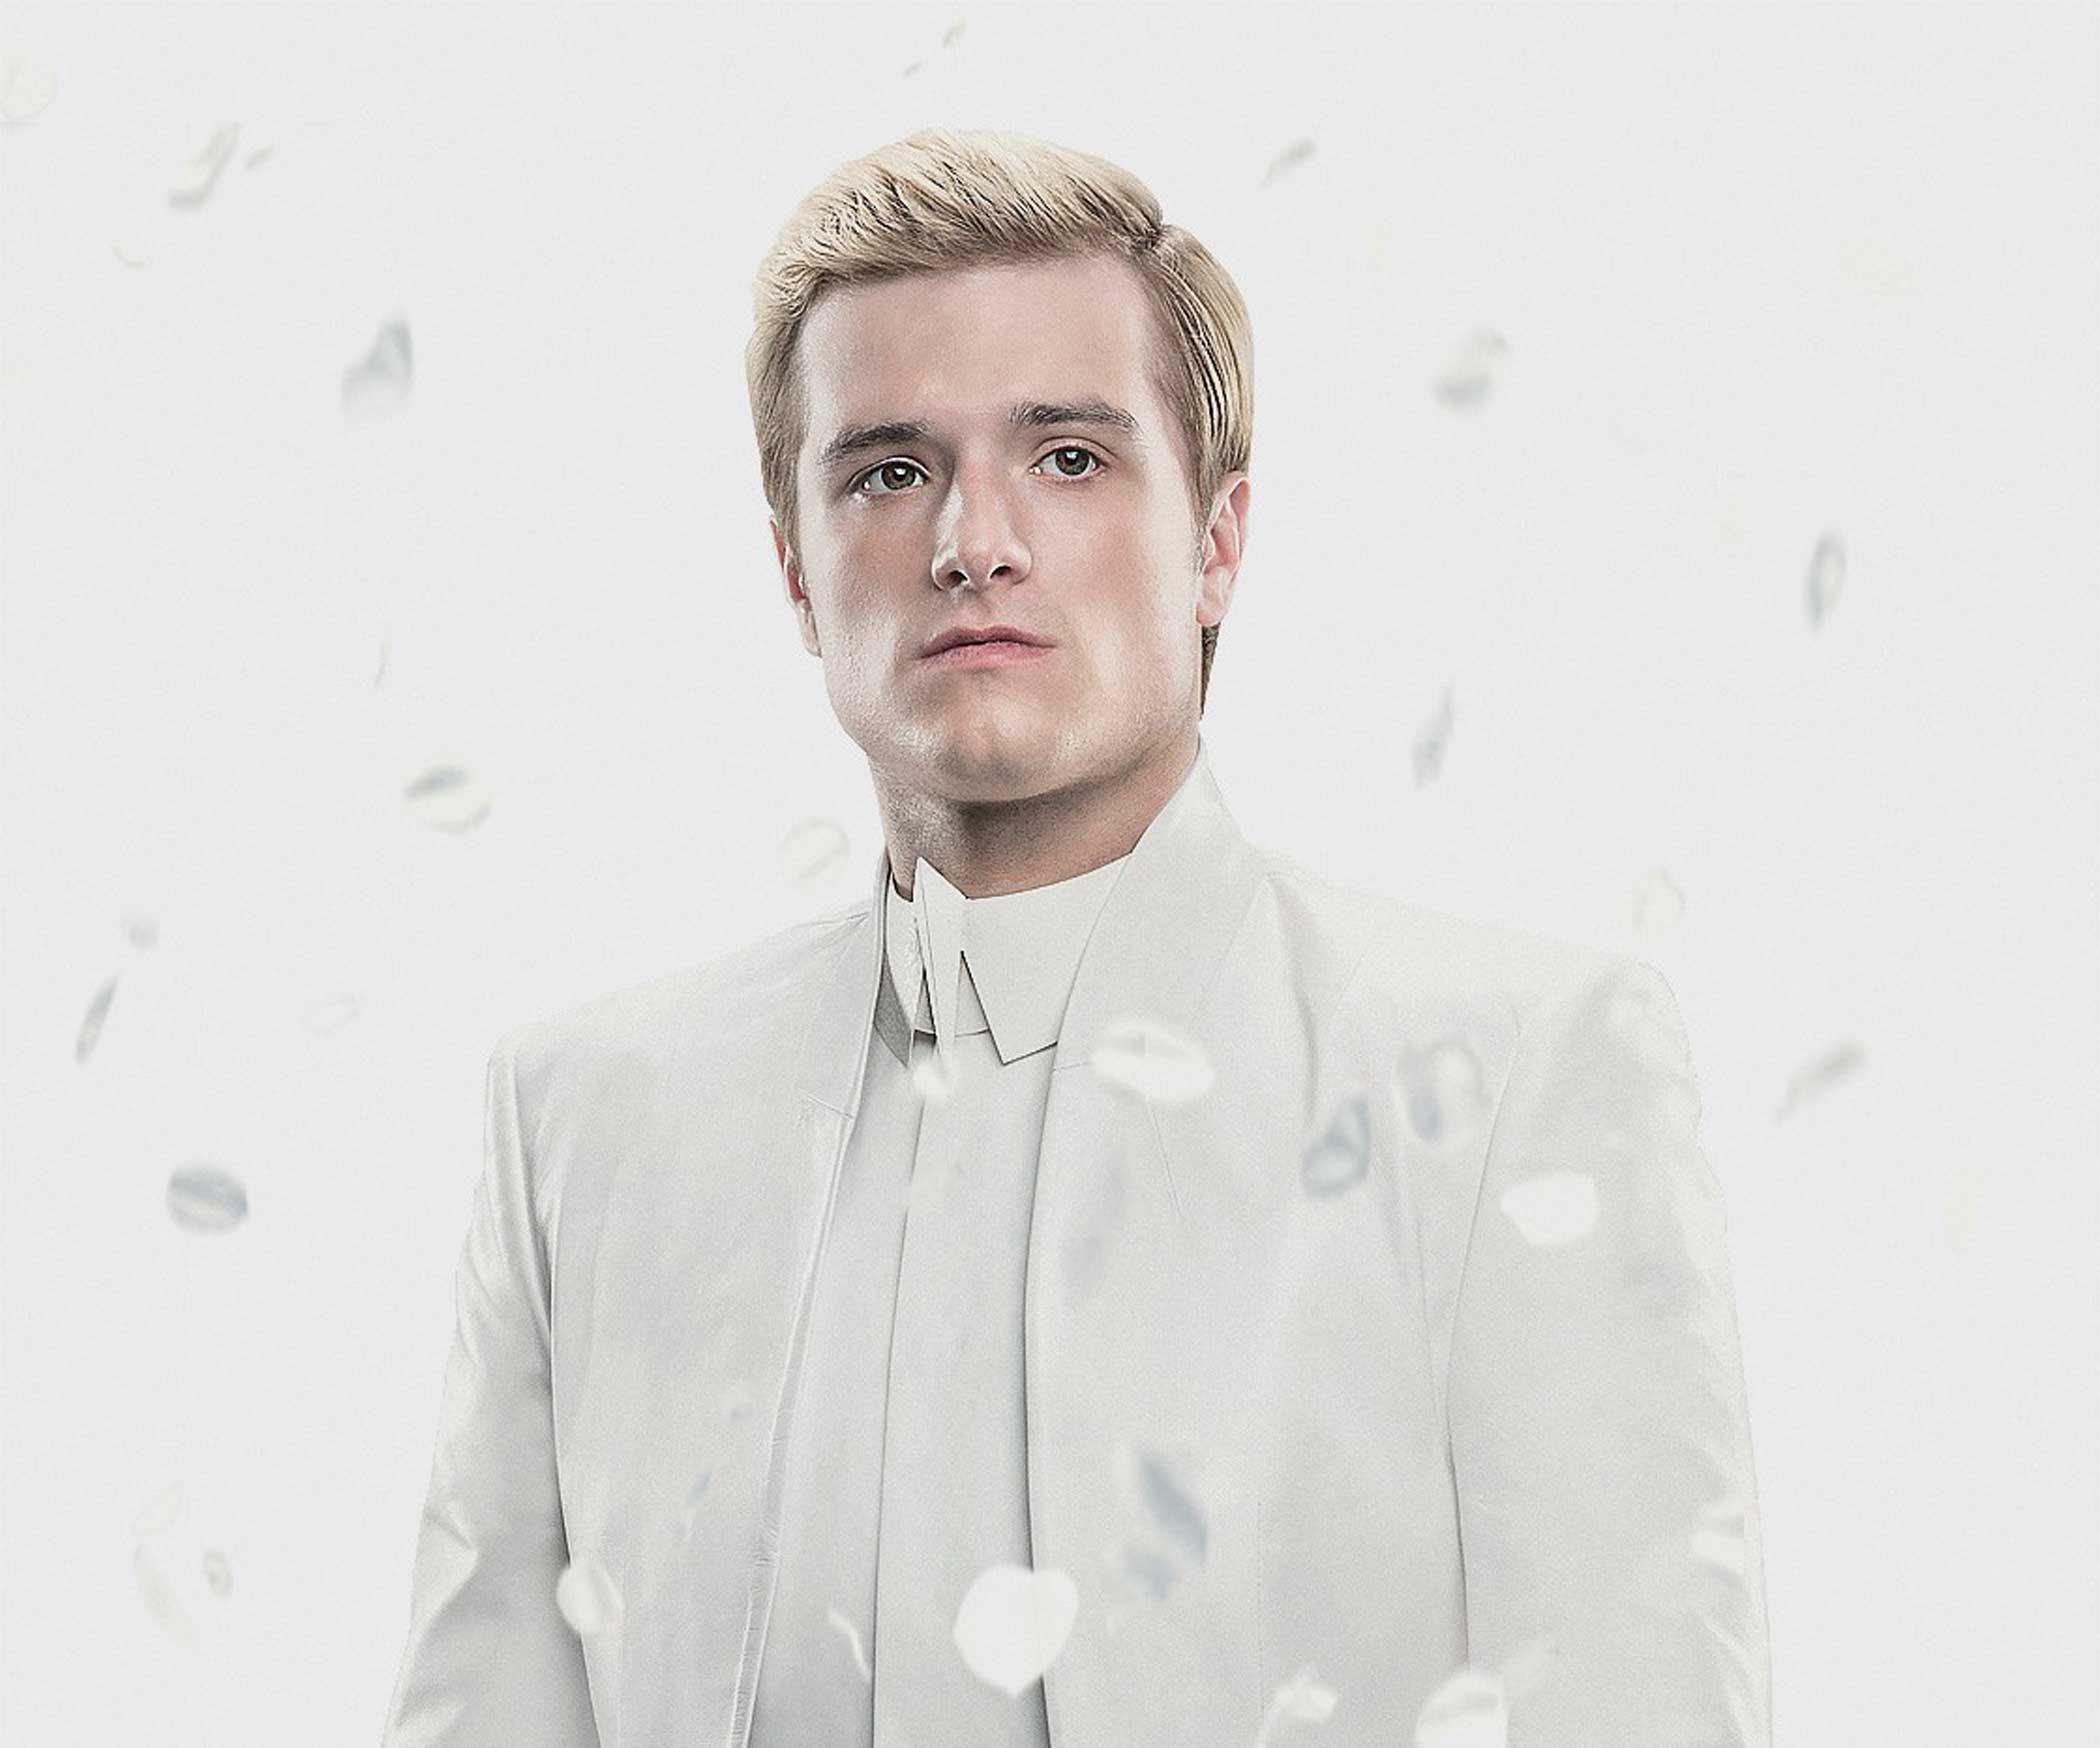 Josh Hutcherson as Peeta Mellark in The Hunger Games: Mockingjay – Part 1, 2014.